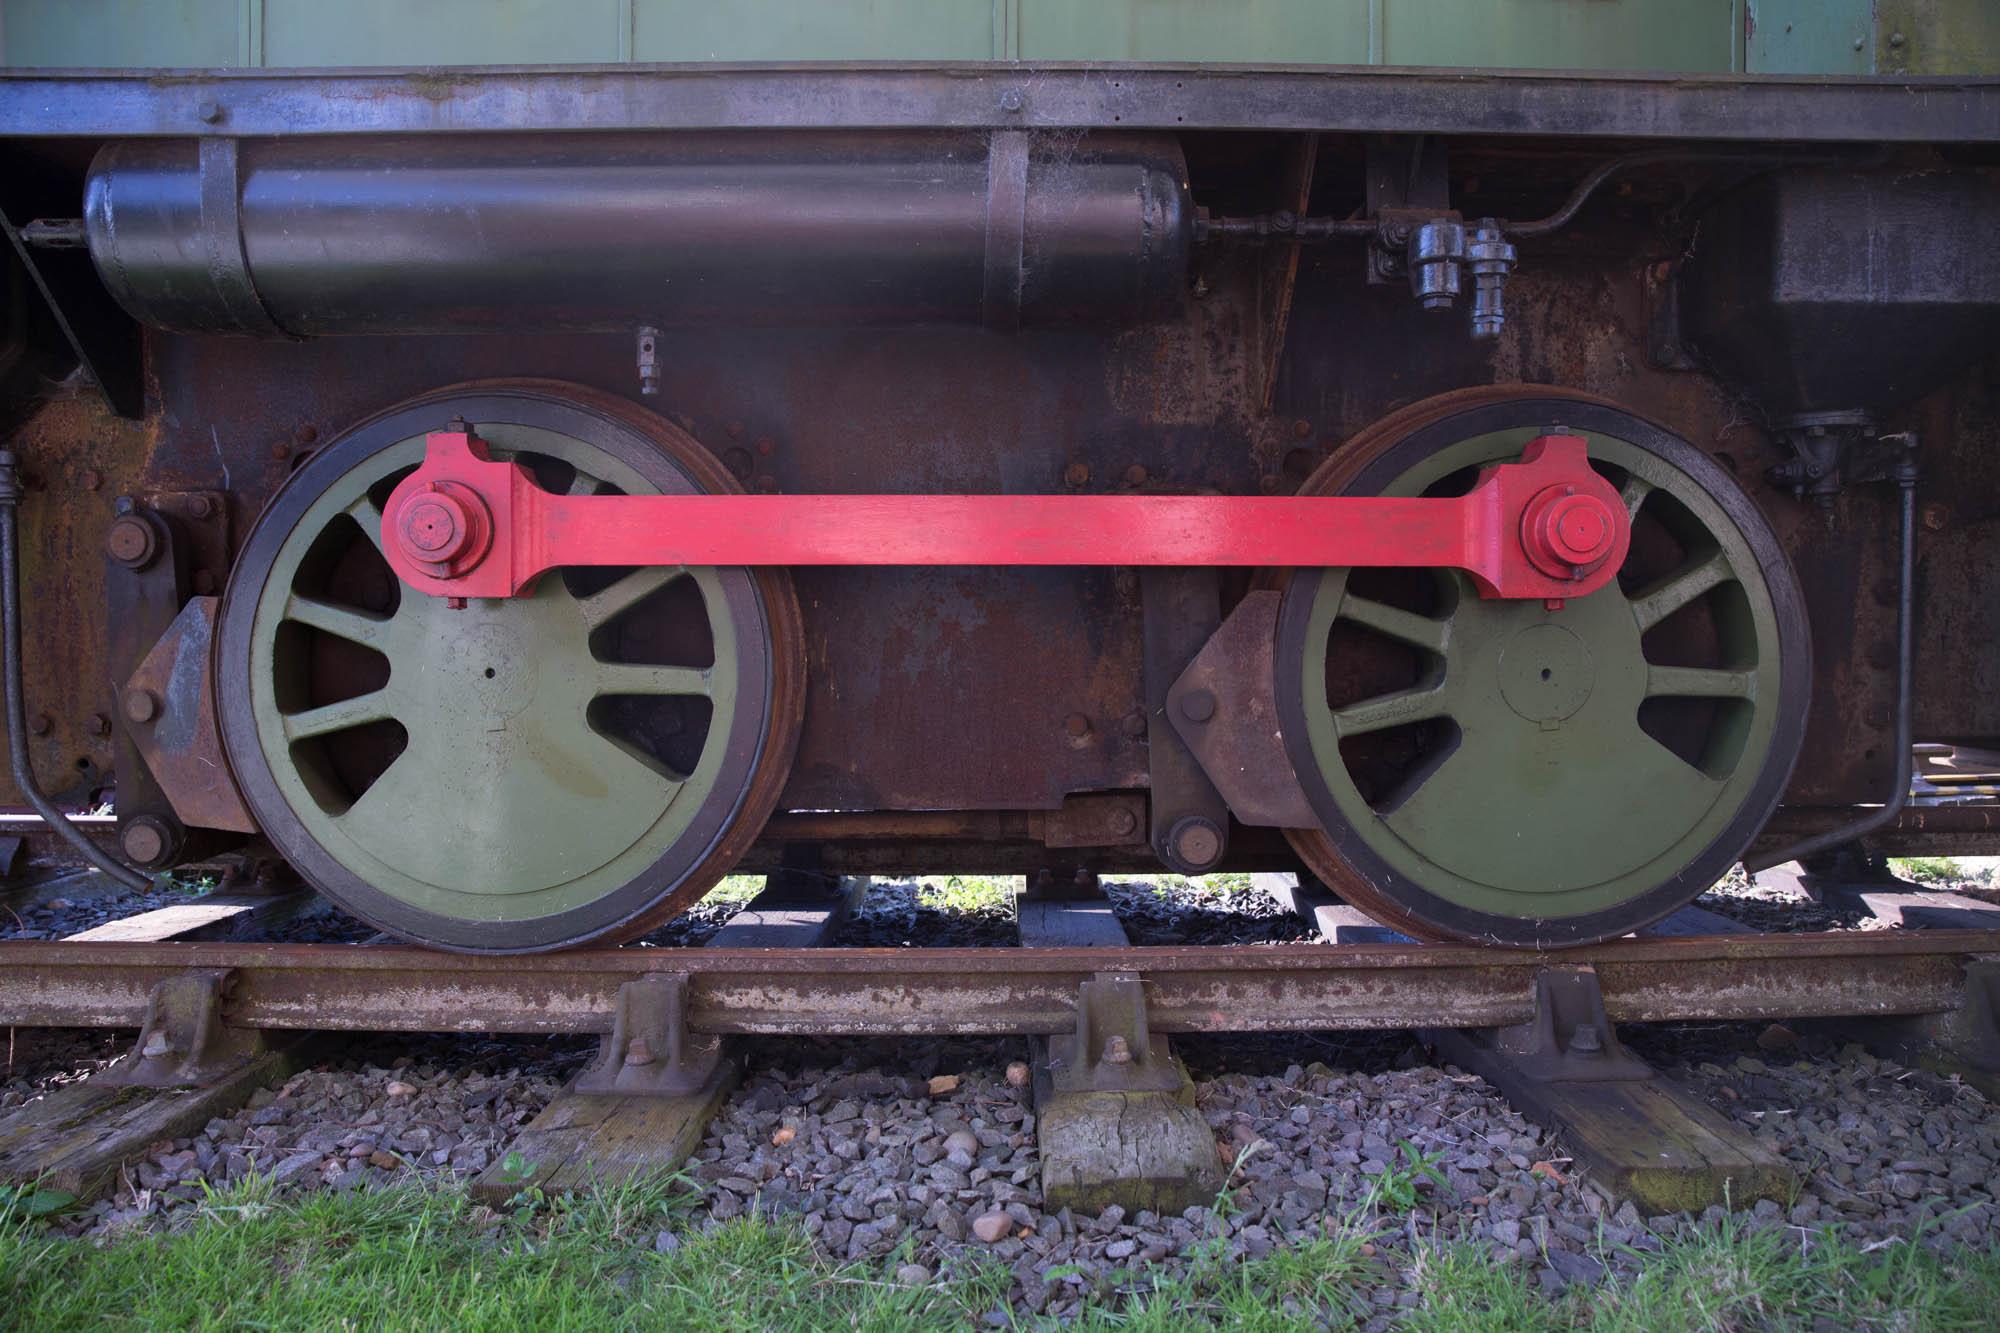 Train050716-1129.jpg